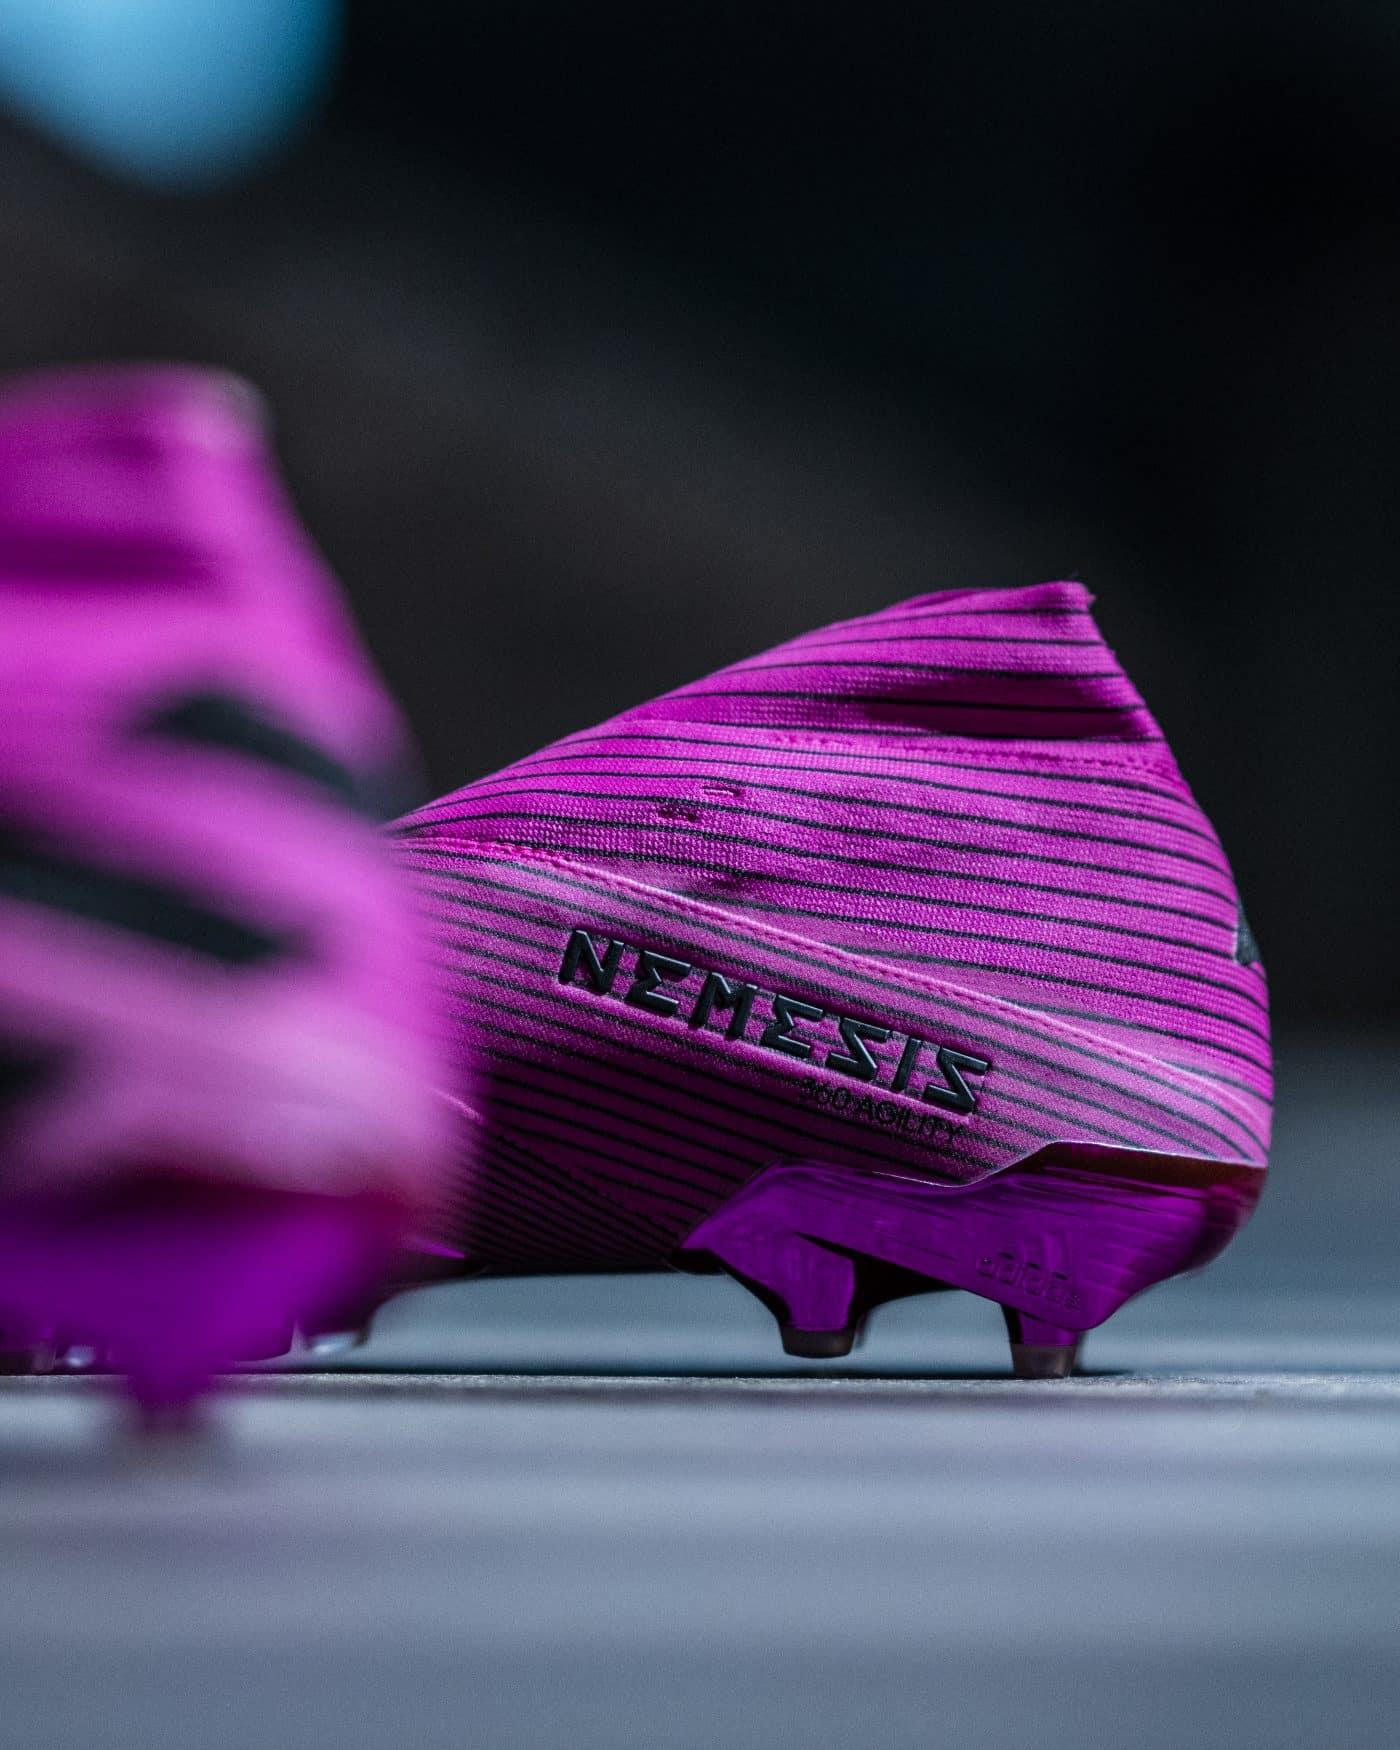 adidas-nemeziz-19-pack-hard-wired-juillet-2019-2